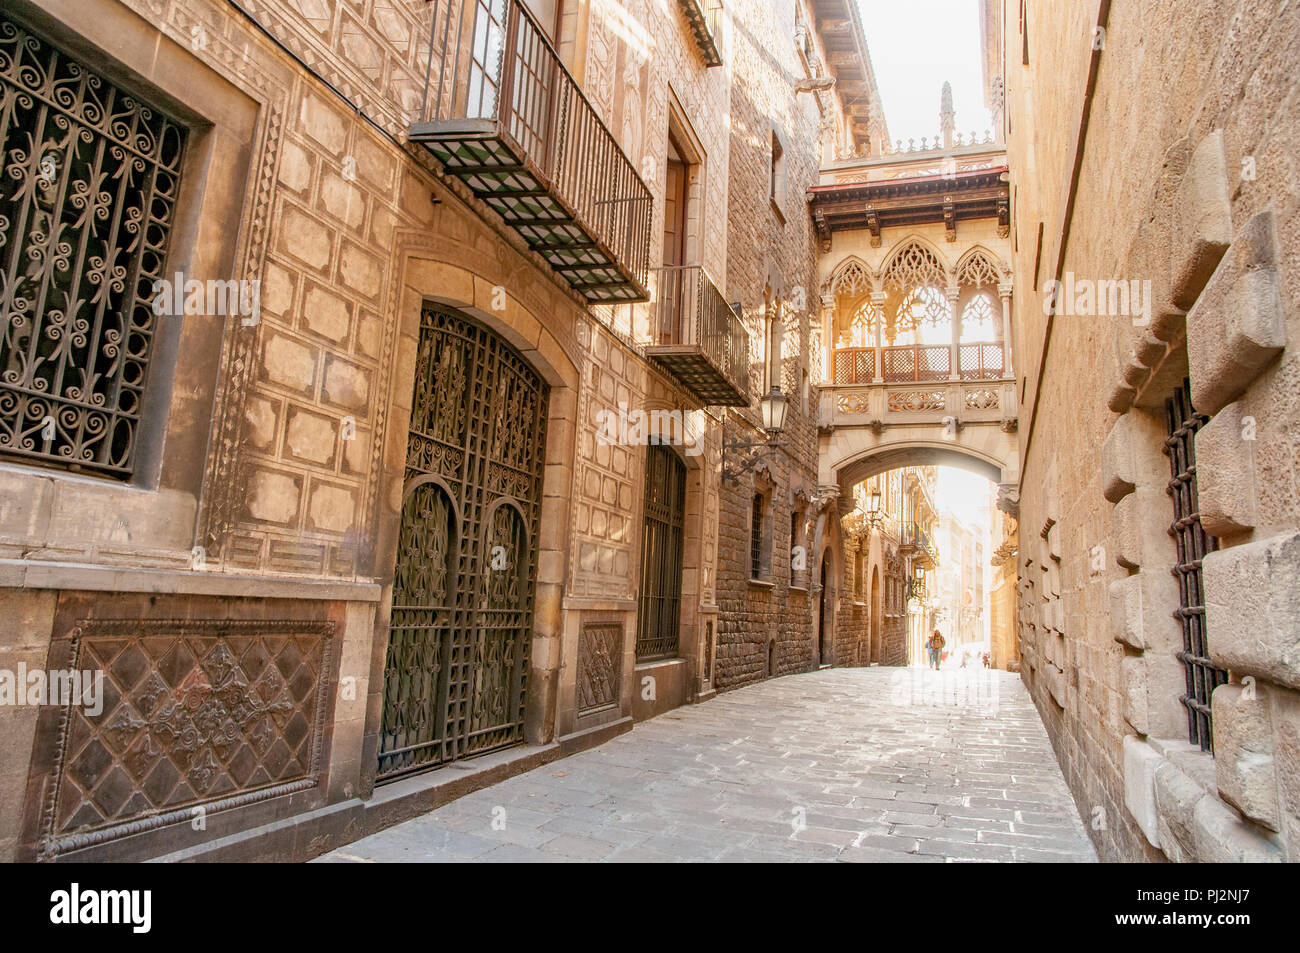 The bridge on Carrer del Bisbe in the Gothic Quarter, Barcelona, Spain - Stock Image